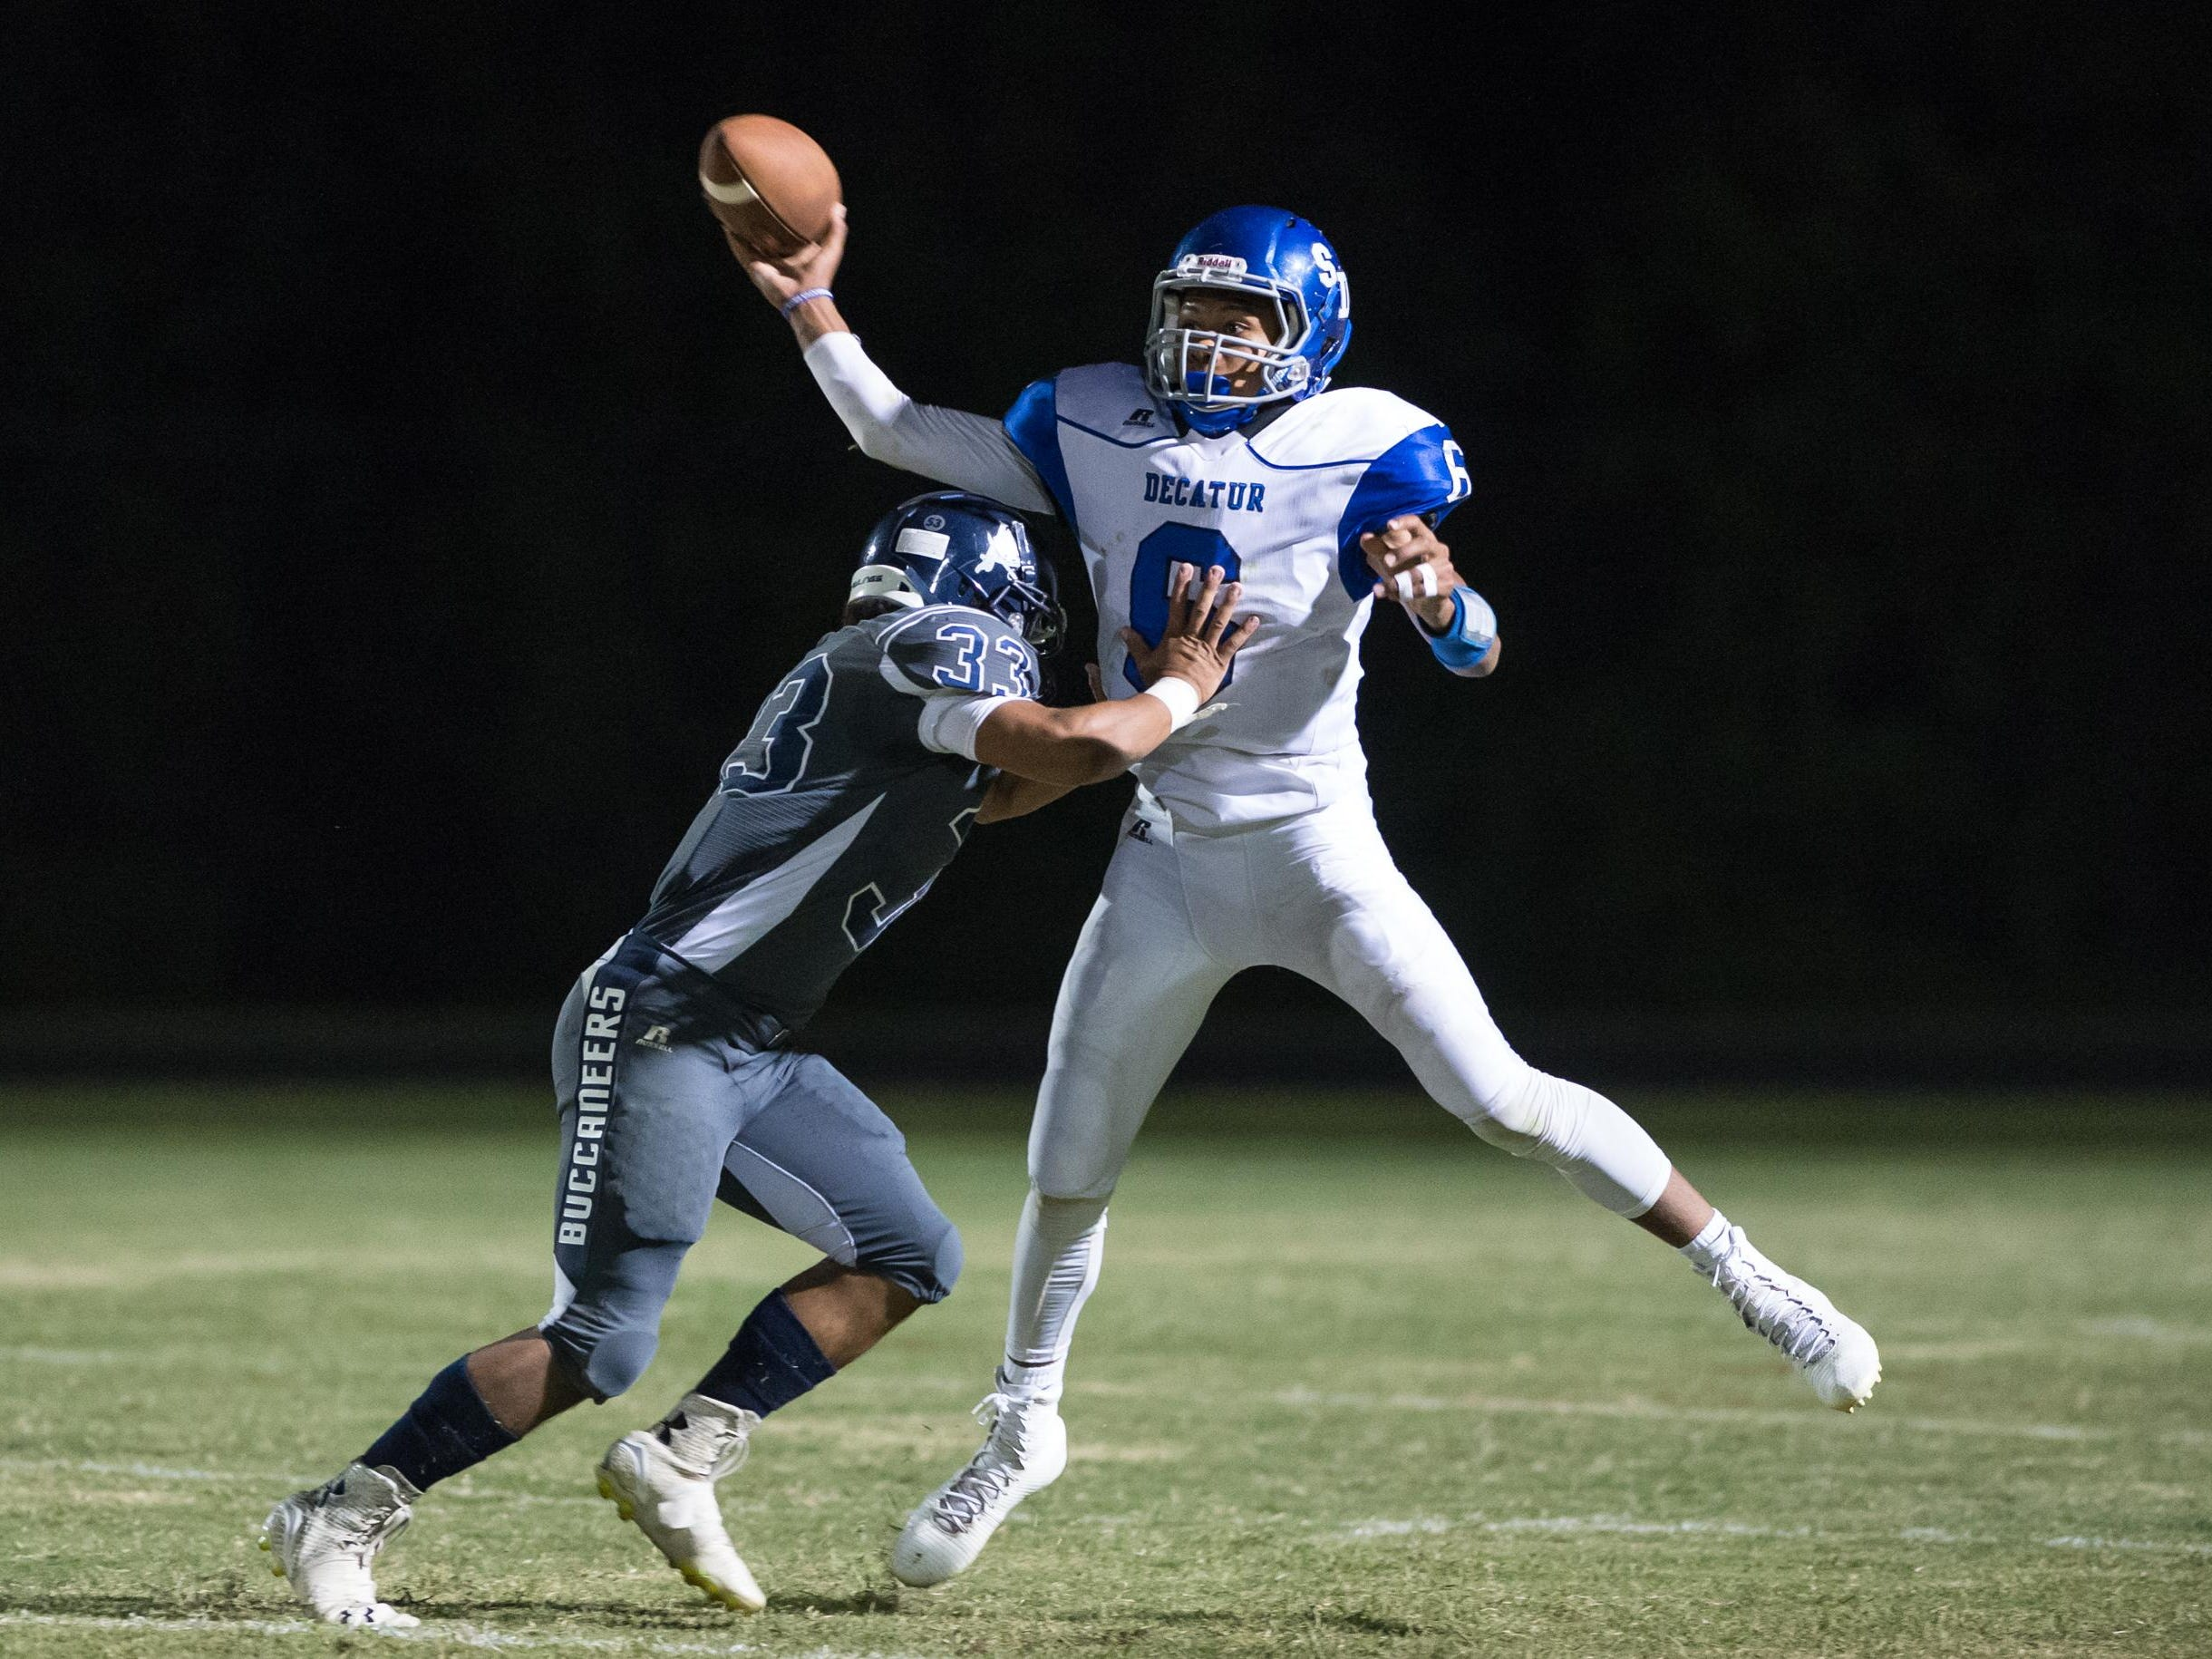 Stephen Decatur quarterback Darion McKenzie throws a pass as Kent Island's DJ Galloway attempts to make a sack.